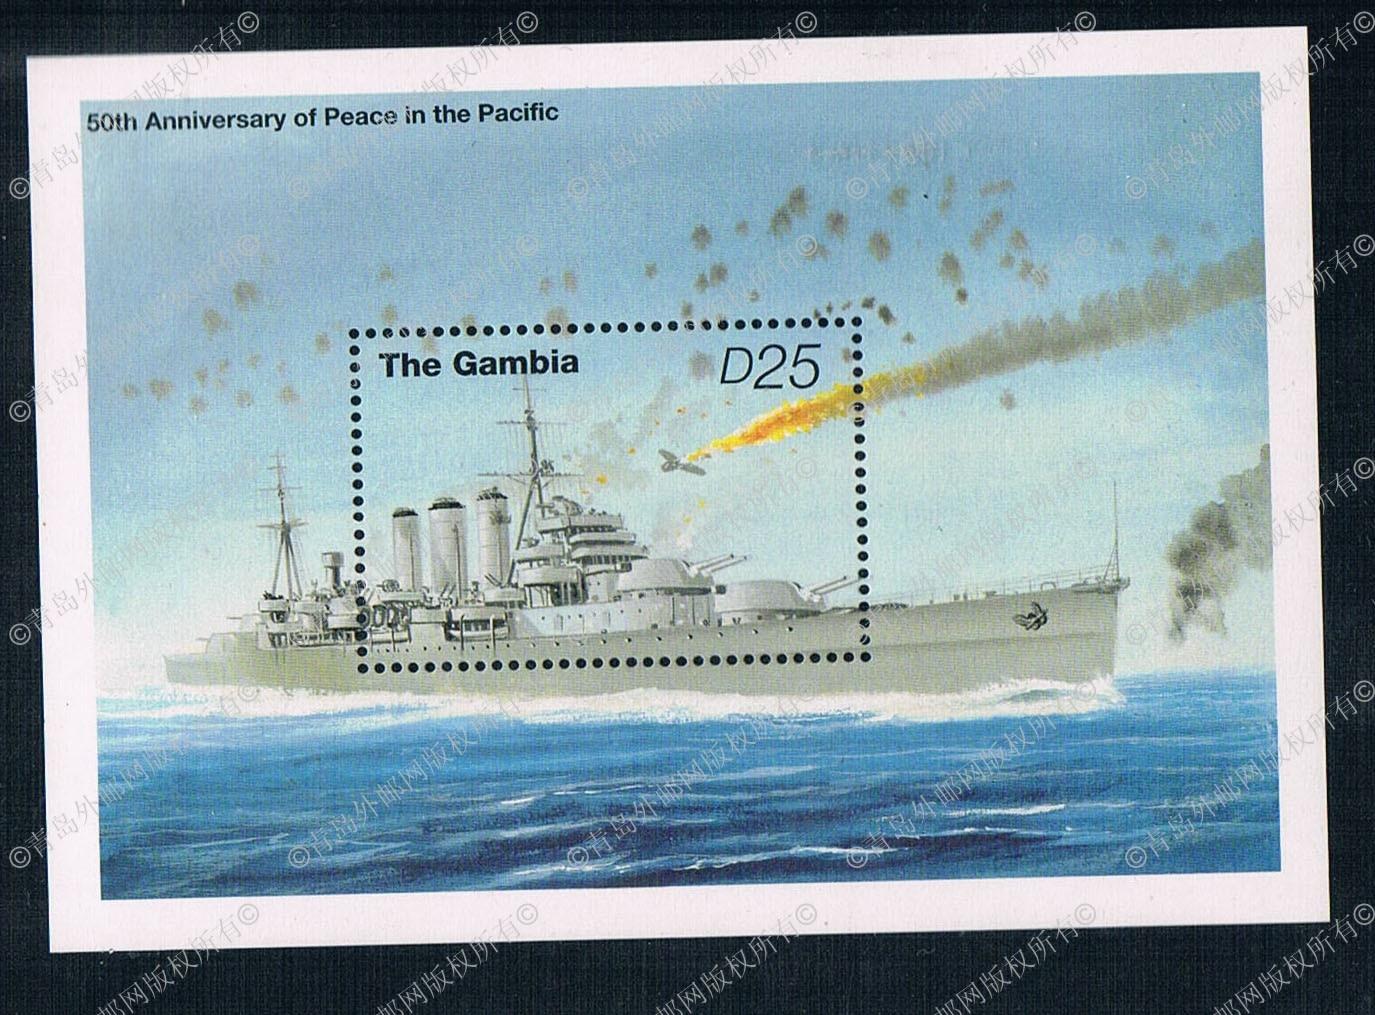 FA0720 Gambia 1995 World War II Pacific War warship aircraft M new 1016 uncanny avengers unity volume 3 civil war ii